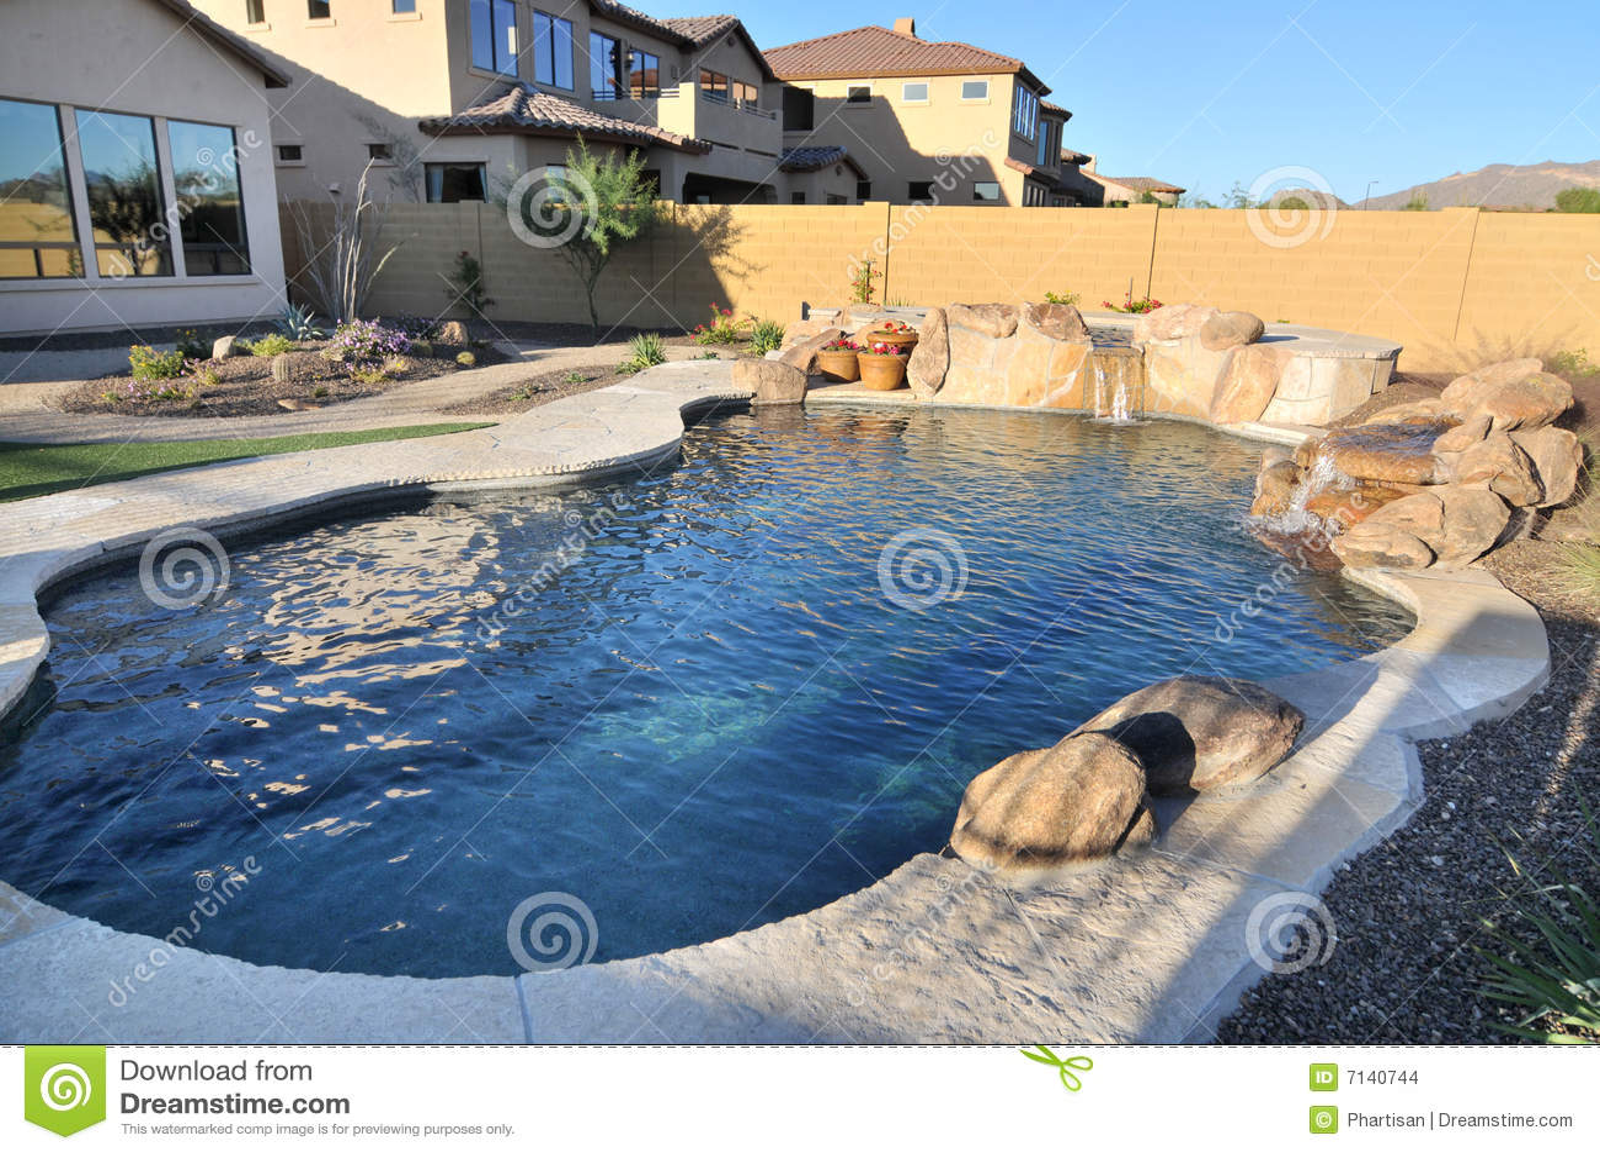 Piscina en patio trasero imagenes de archivo imagen 7140744 for Piscina z